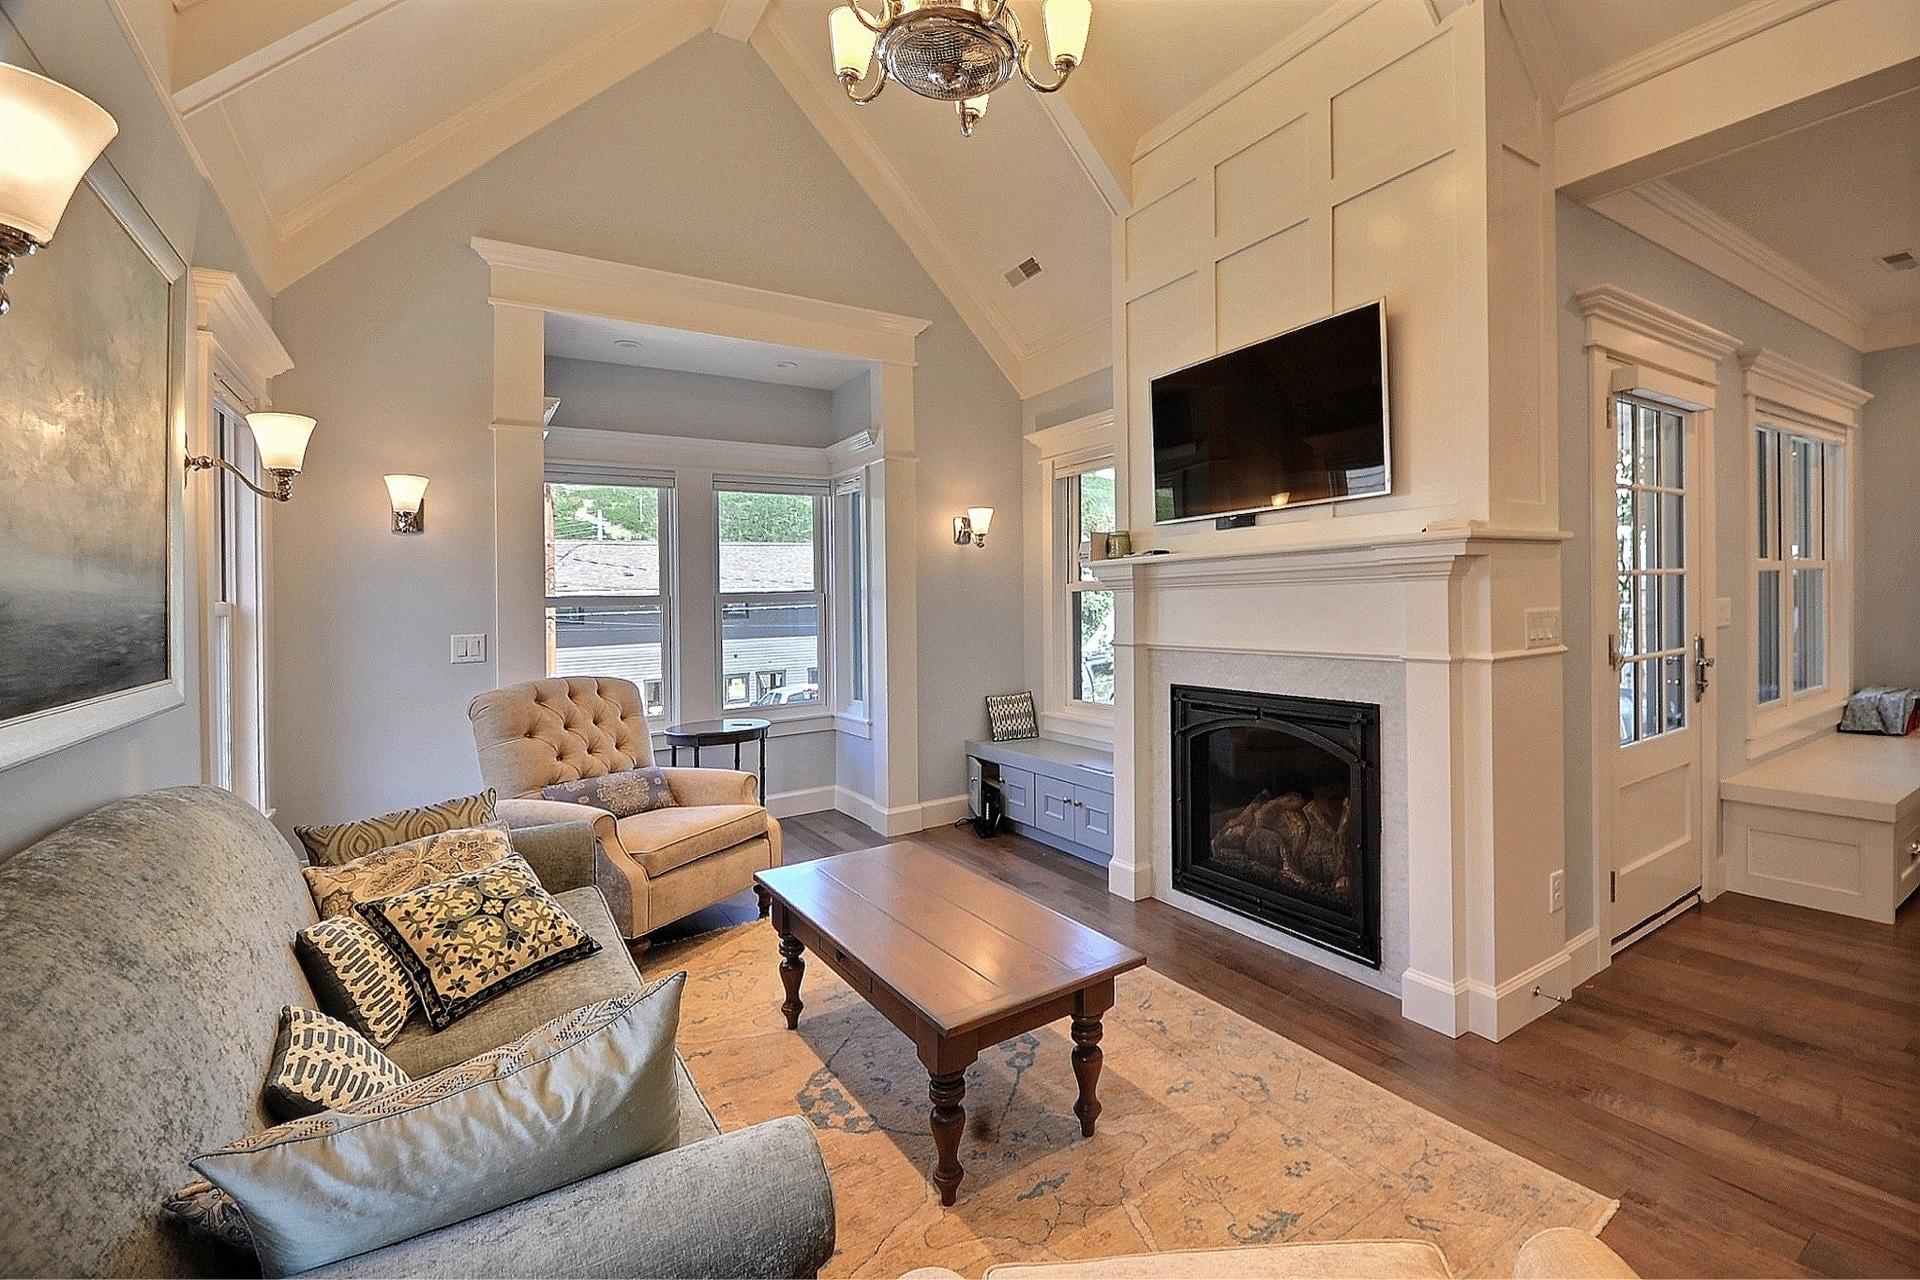 Woodside Avenue, living room - architectural design by Elliott Workgroup